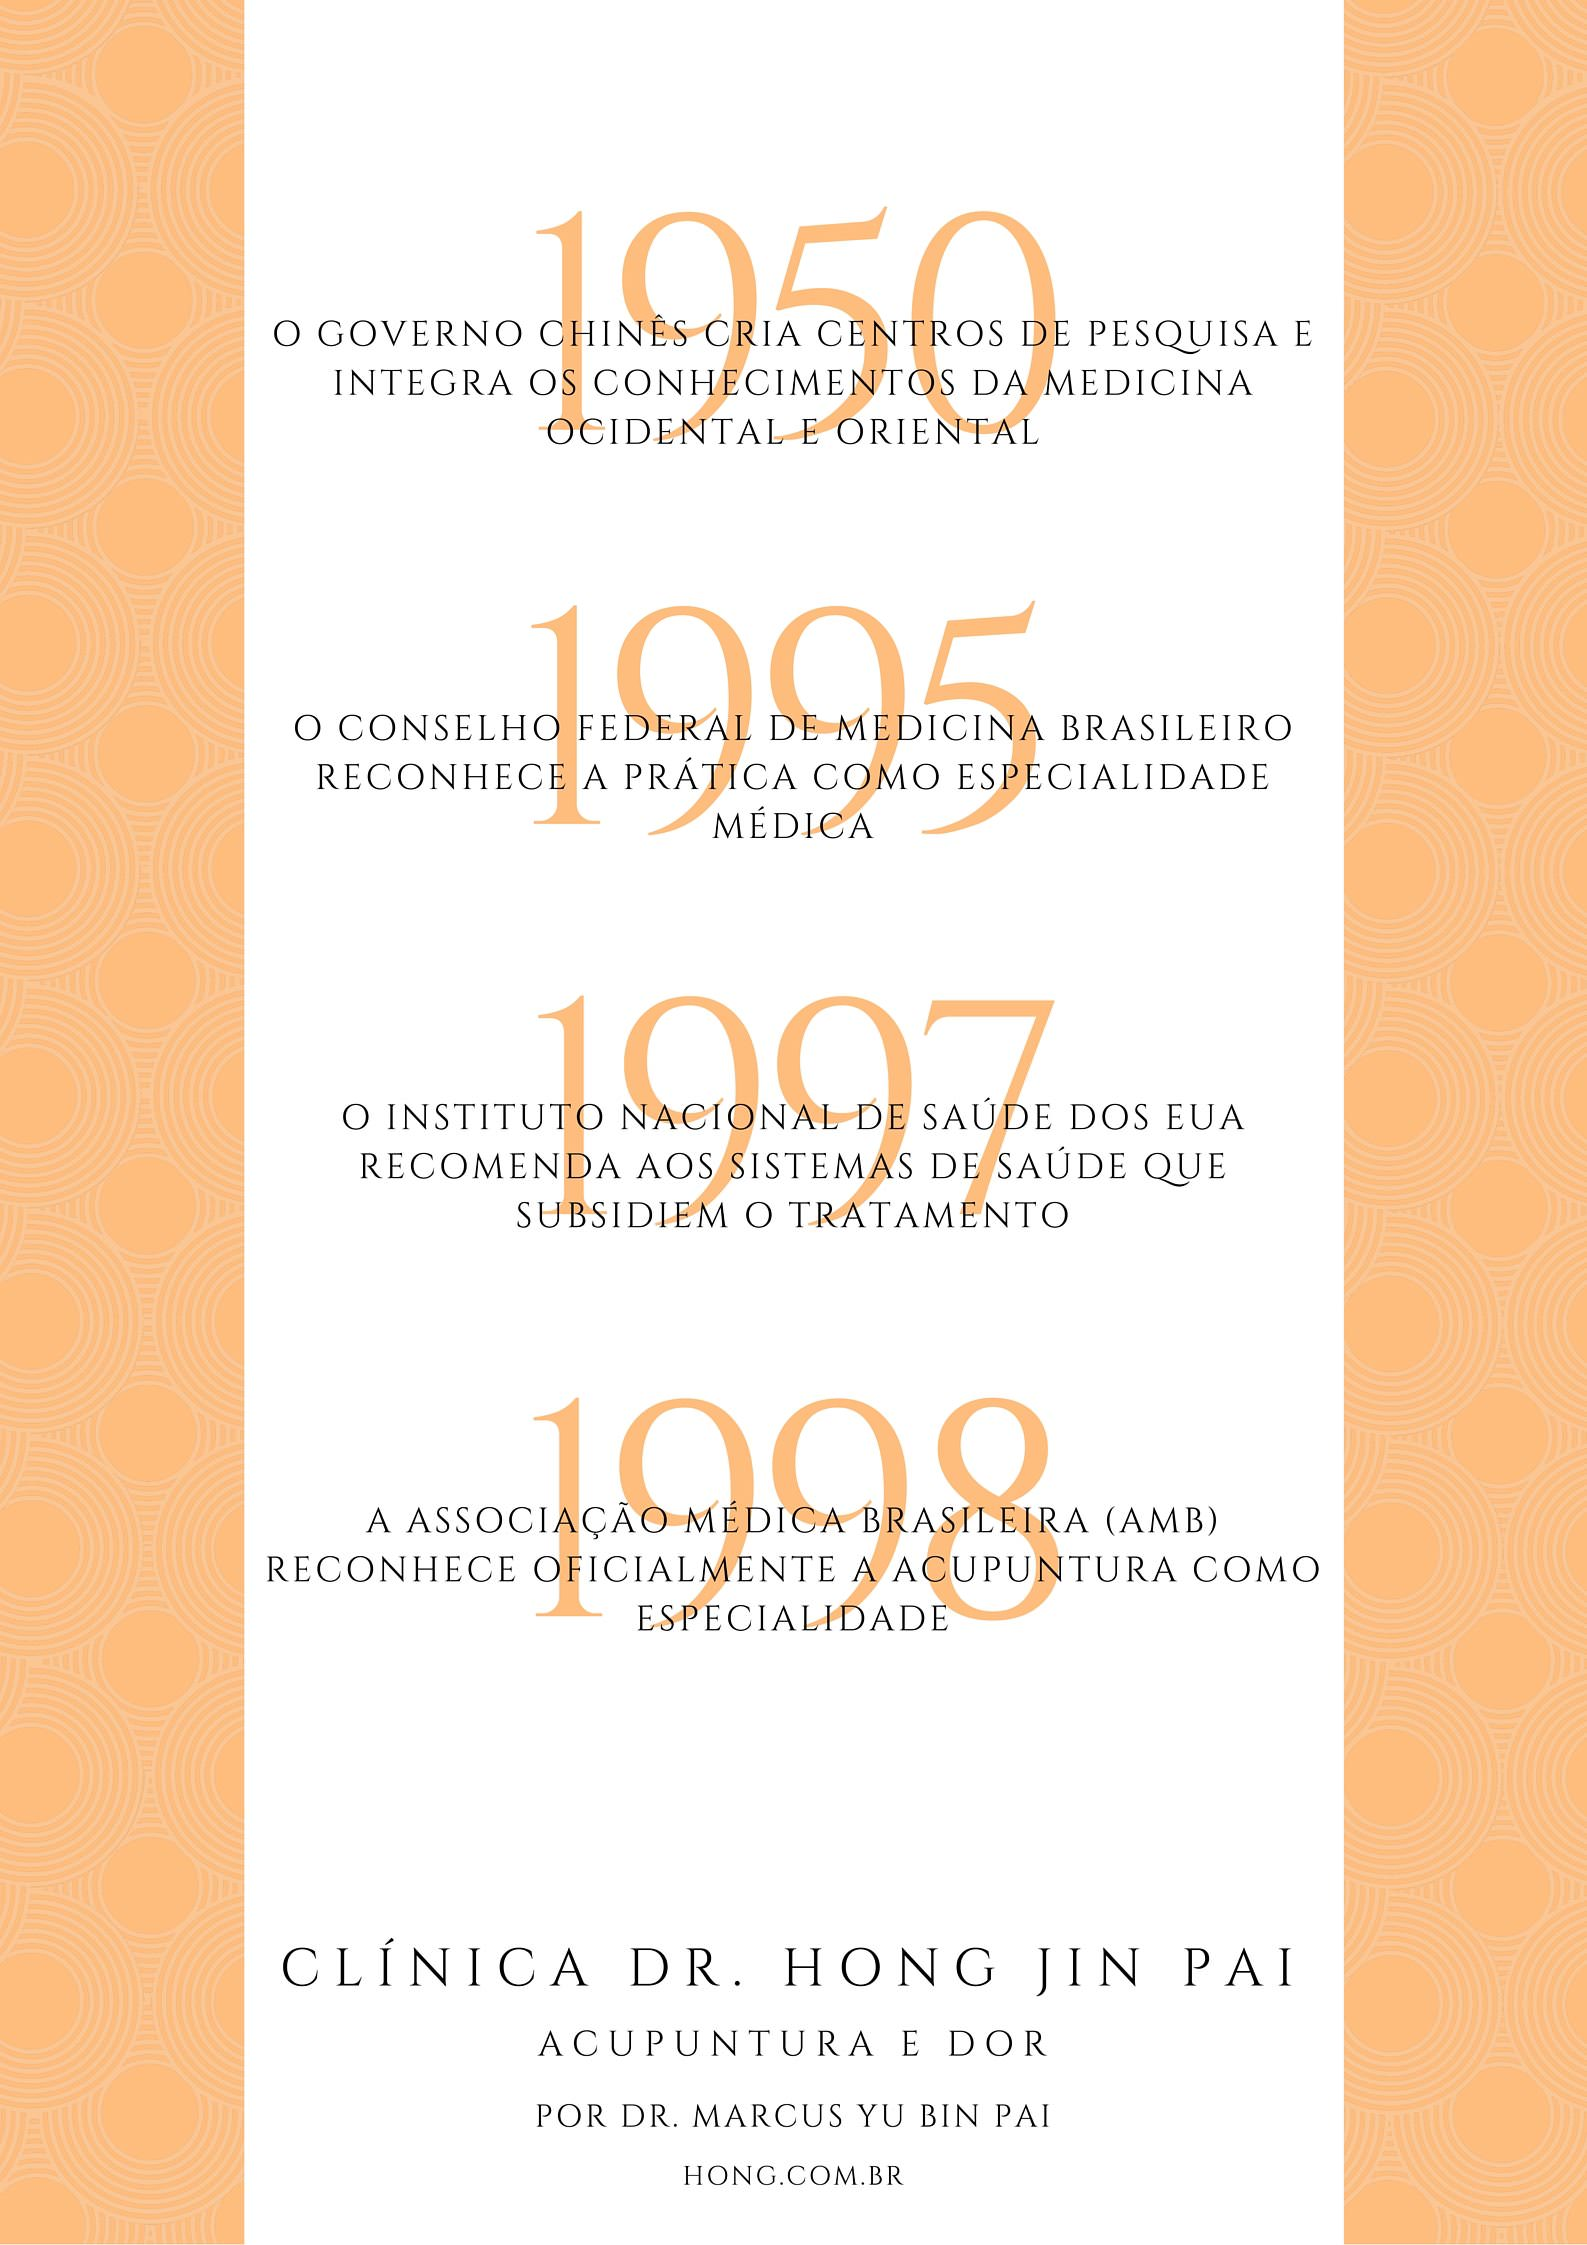 infografico breve historico acupuntura no brasil por dr Marcus Yu Bin Pai